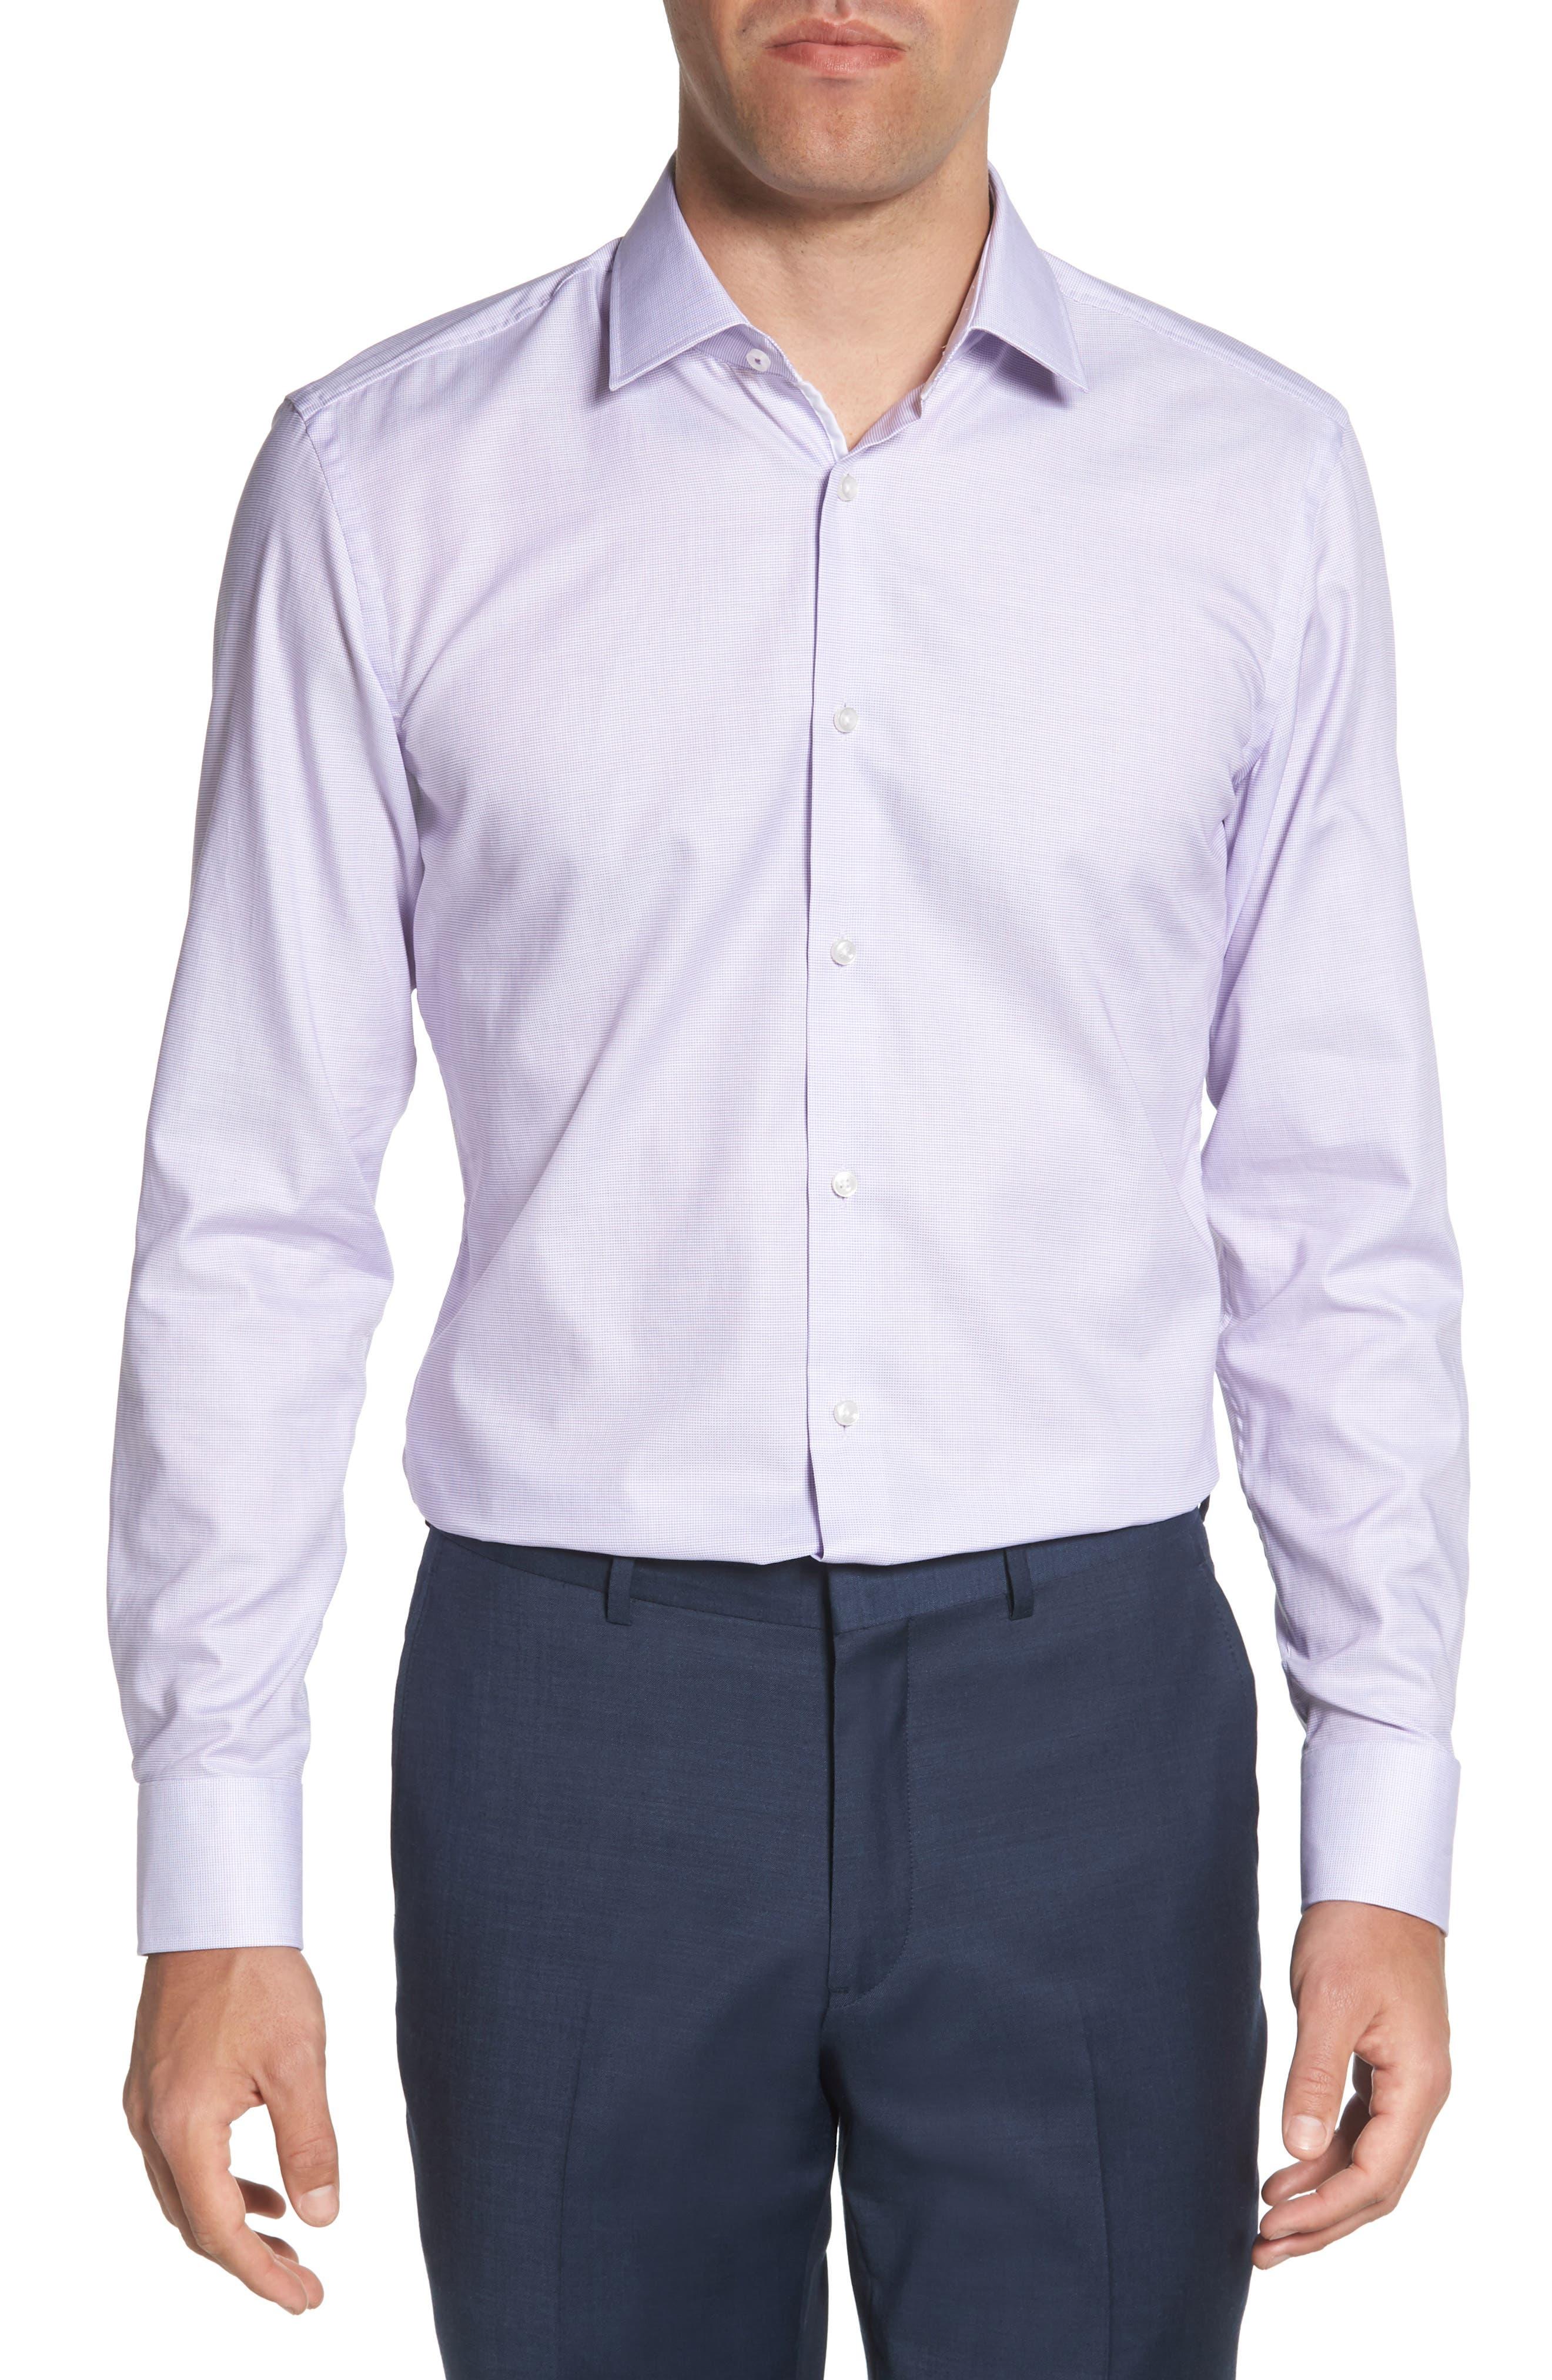 Jesse Slim Fit Dress Shirt,                             Main thumbnail 1, color,                             Purple